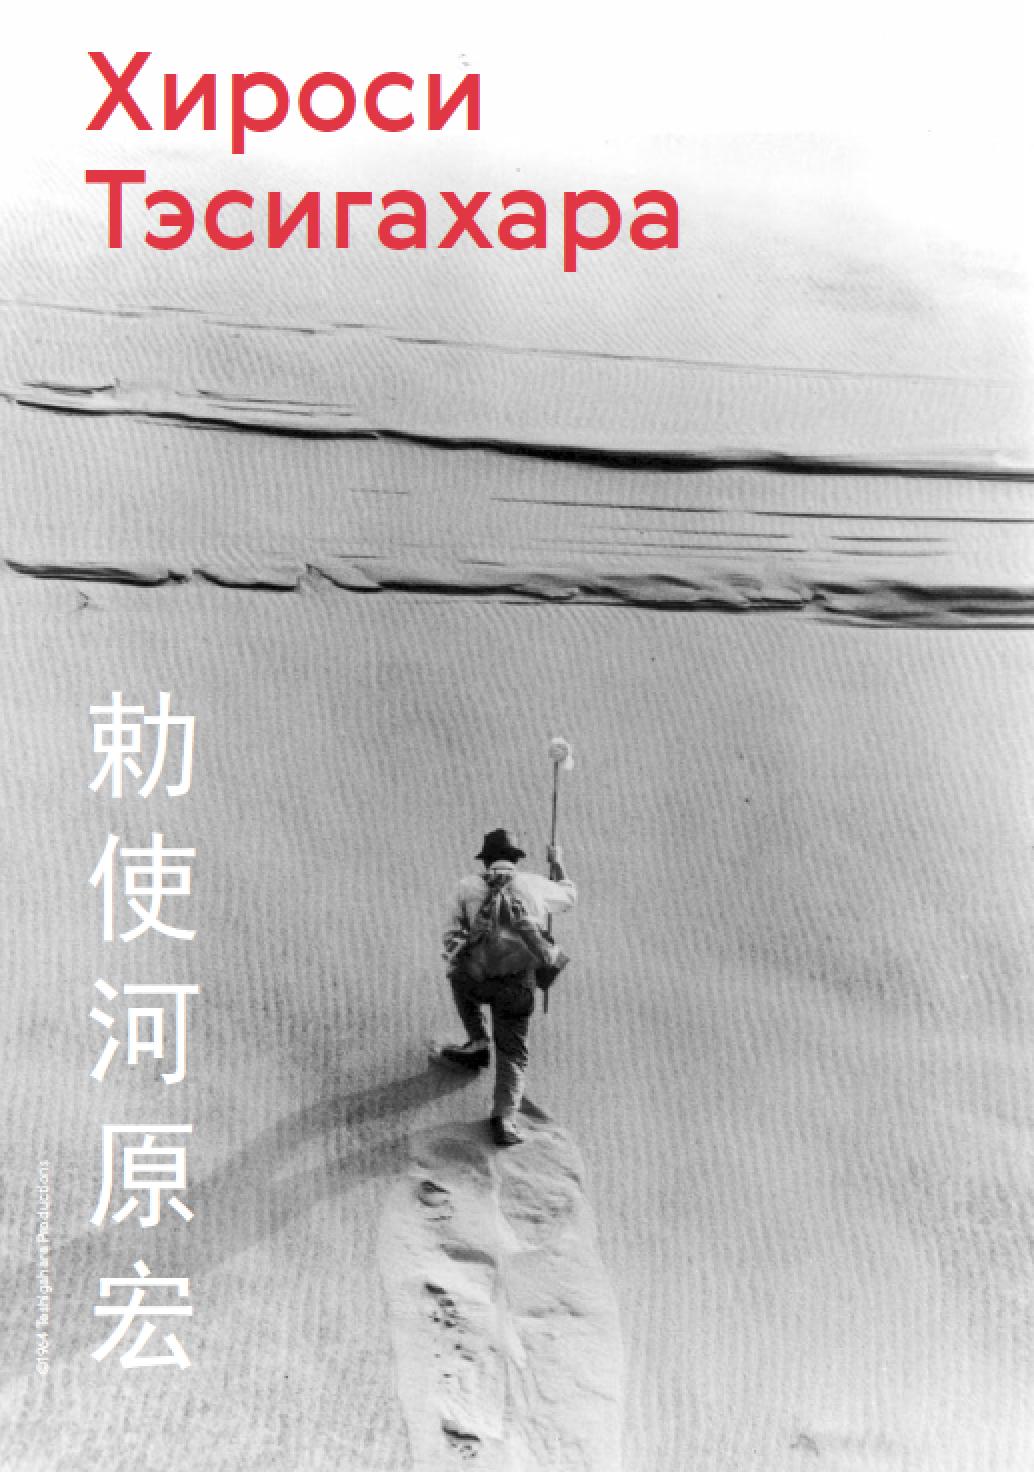 Хироси Тэсигахара